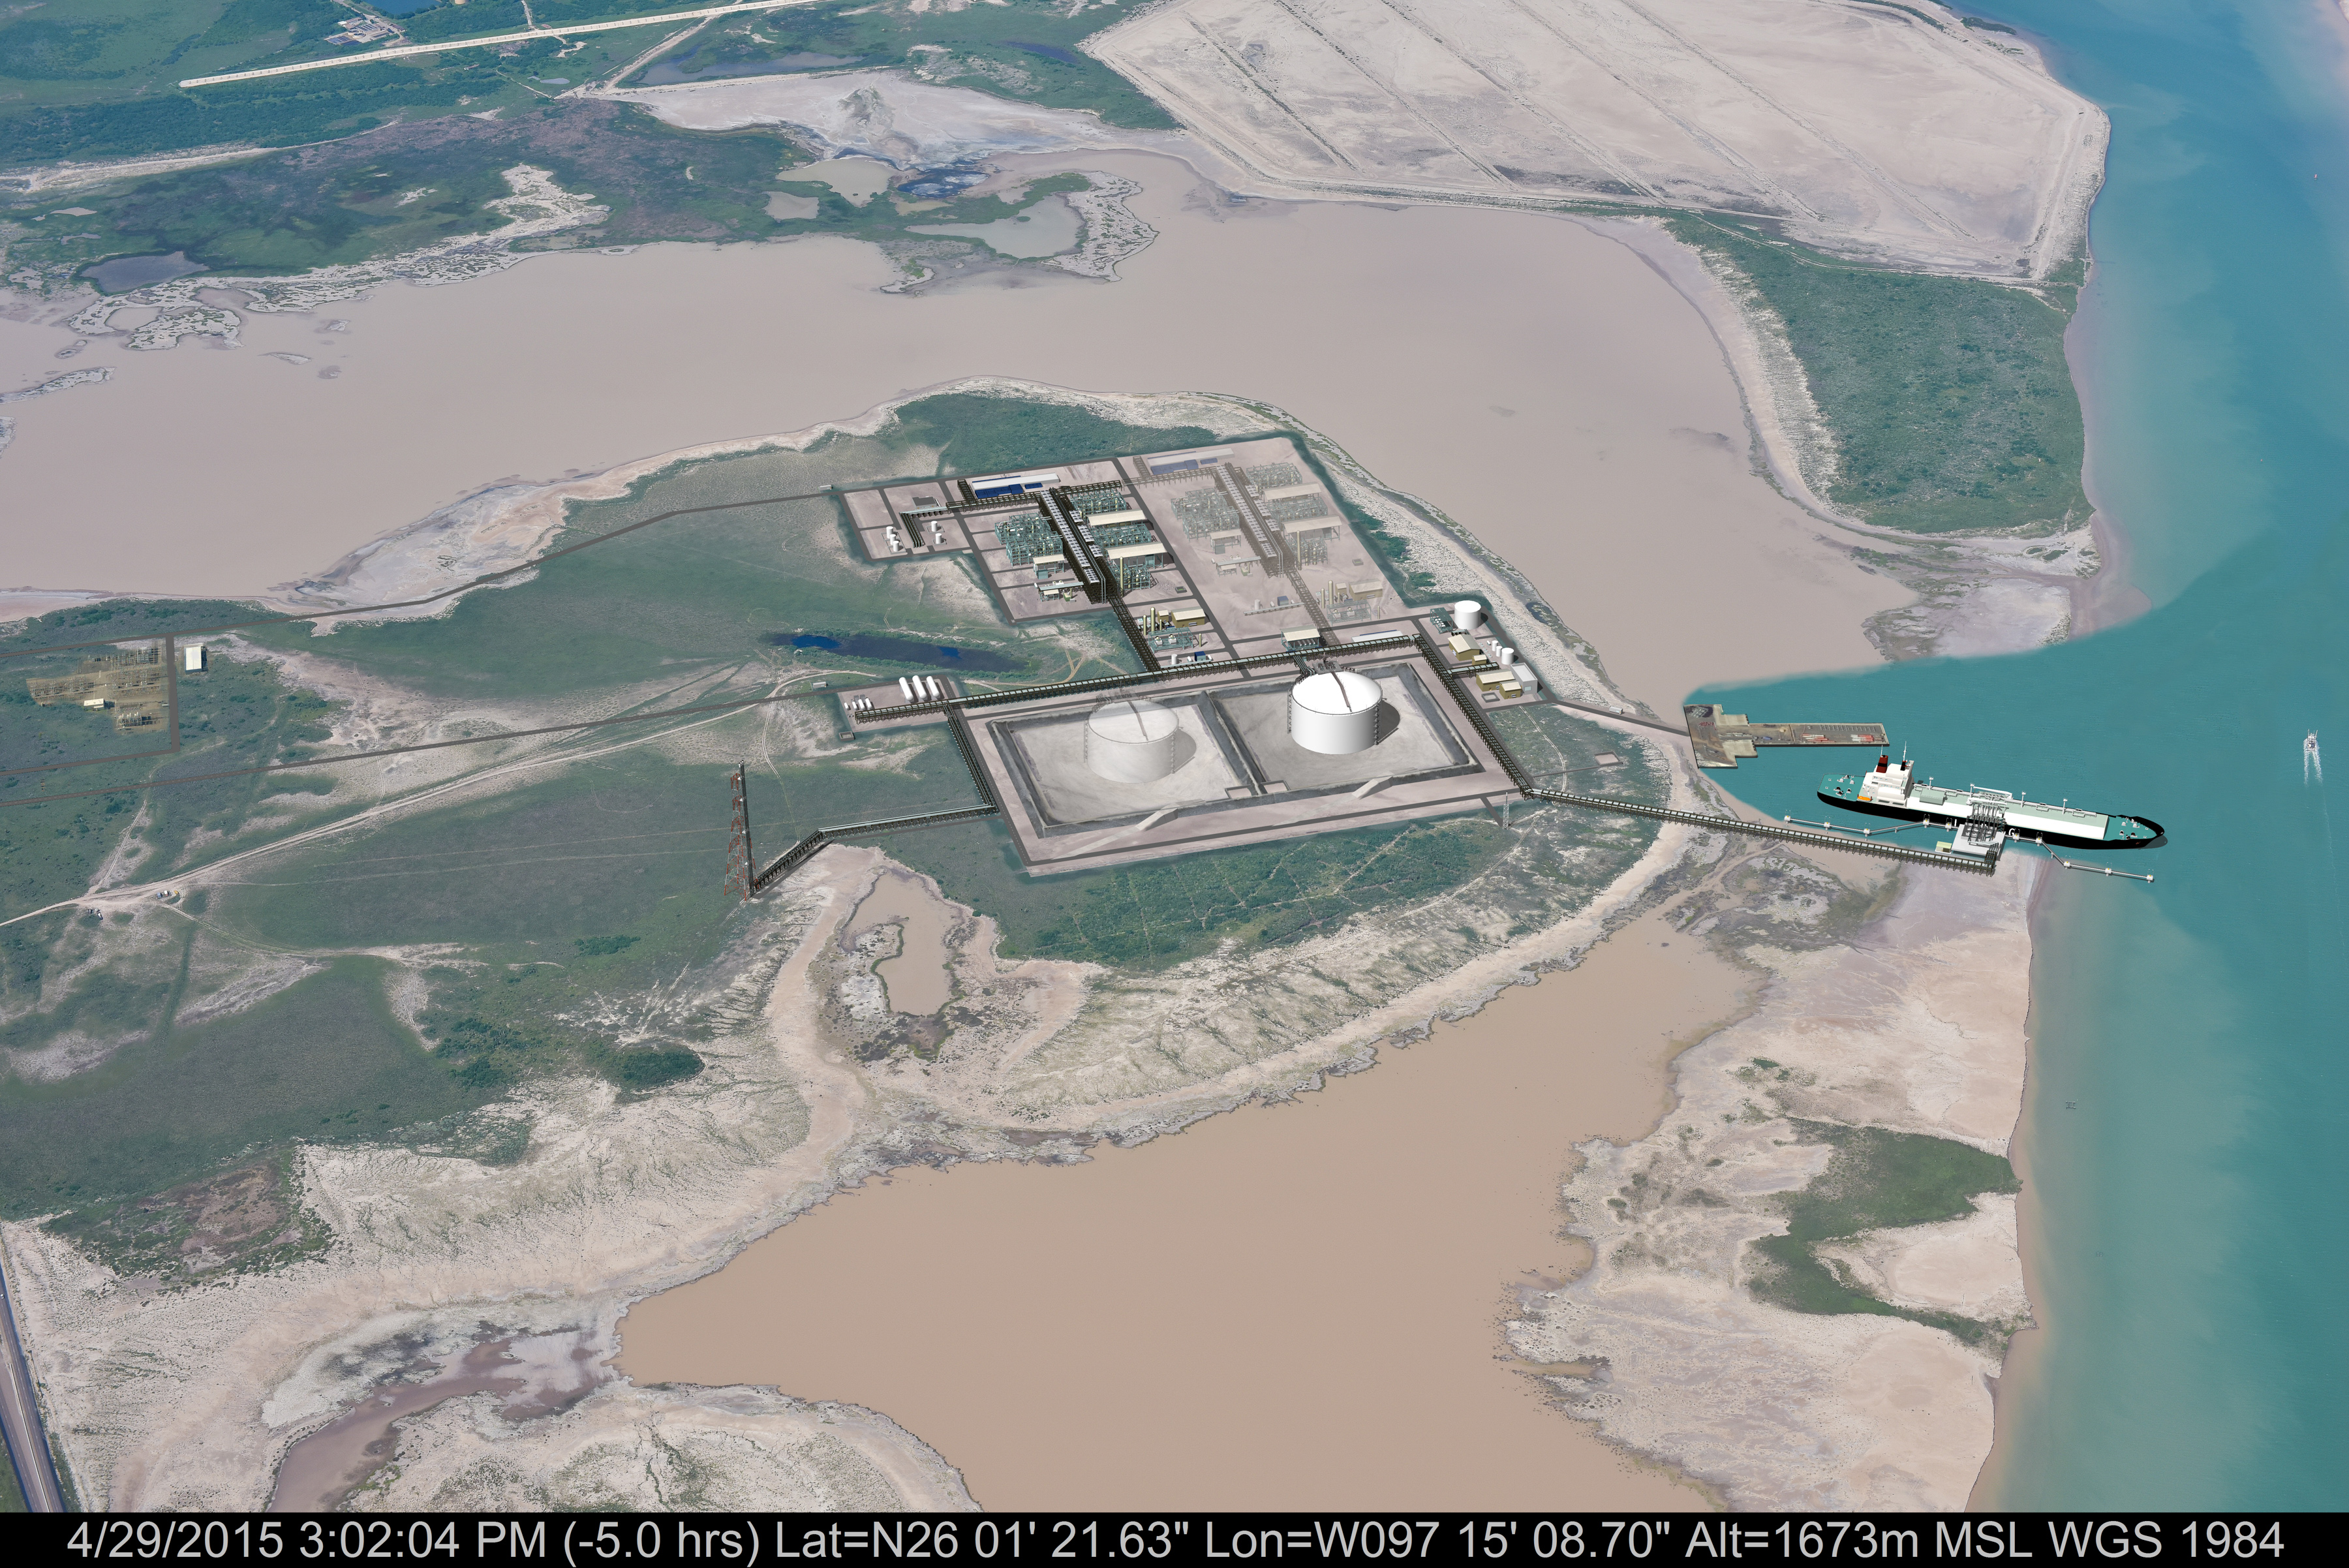 Texas LNG - Rendering 2